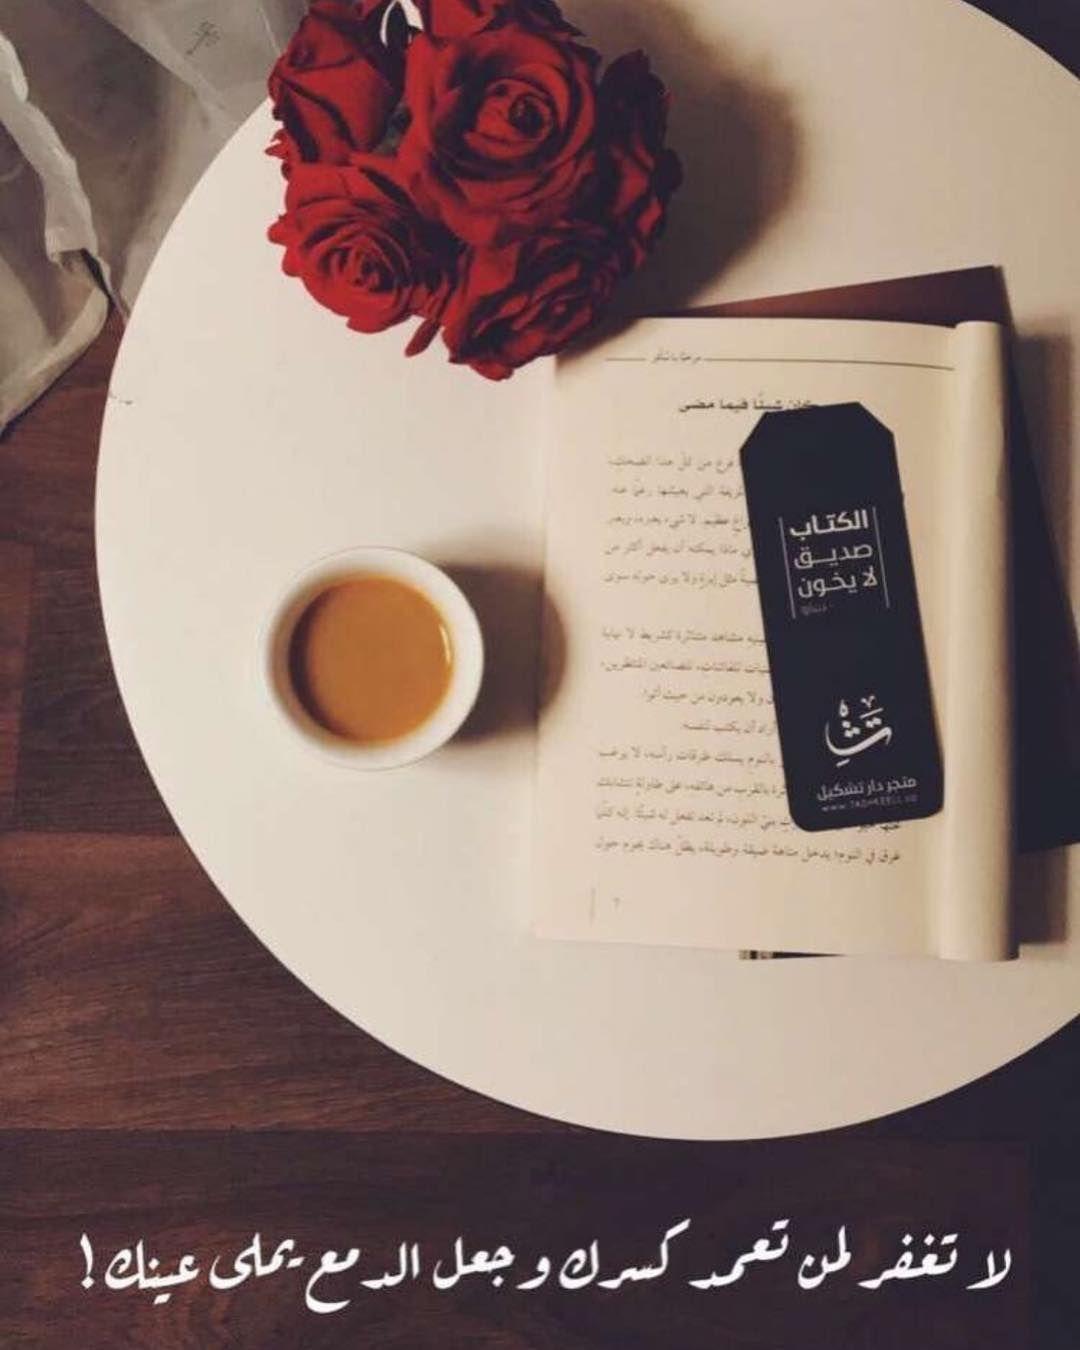 Pin By Amanda Payton On اقوال Cute Emoji Wallpaper Arabic Books Arabic Quotes